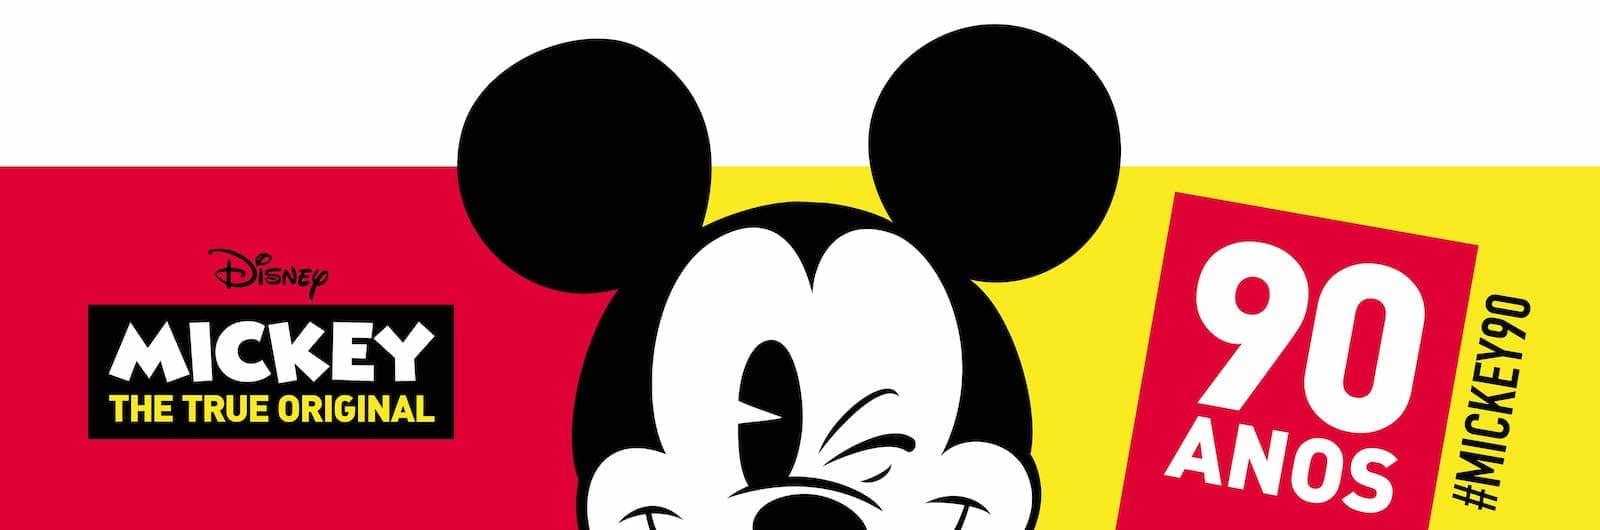 Curiosidade_Mickey_90_ANOS 11